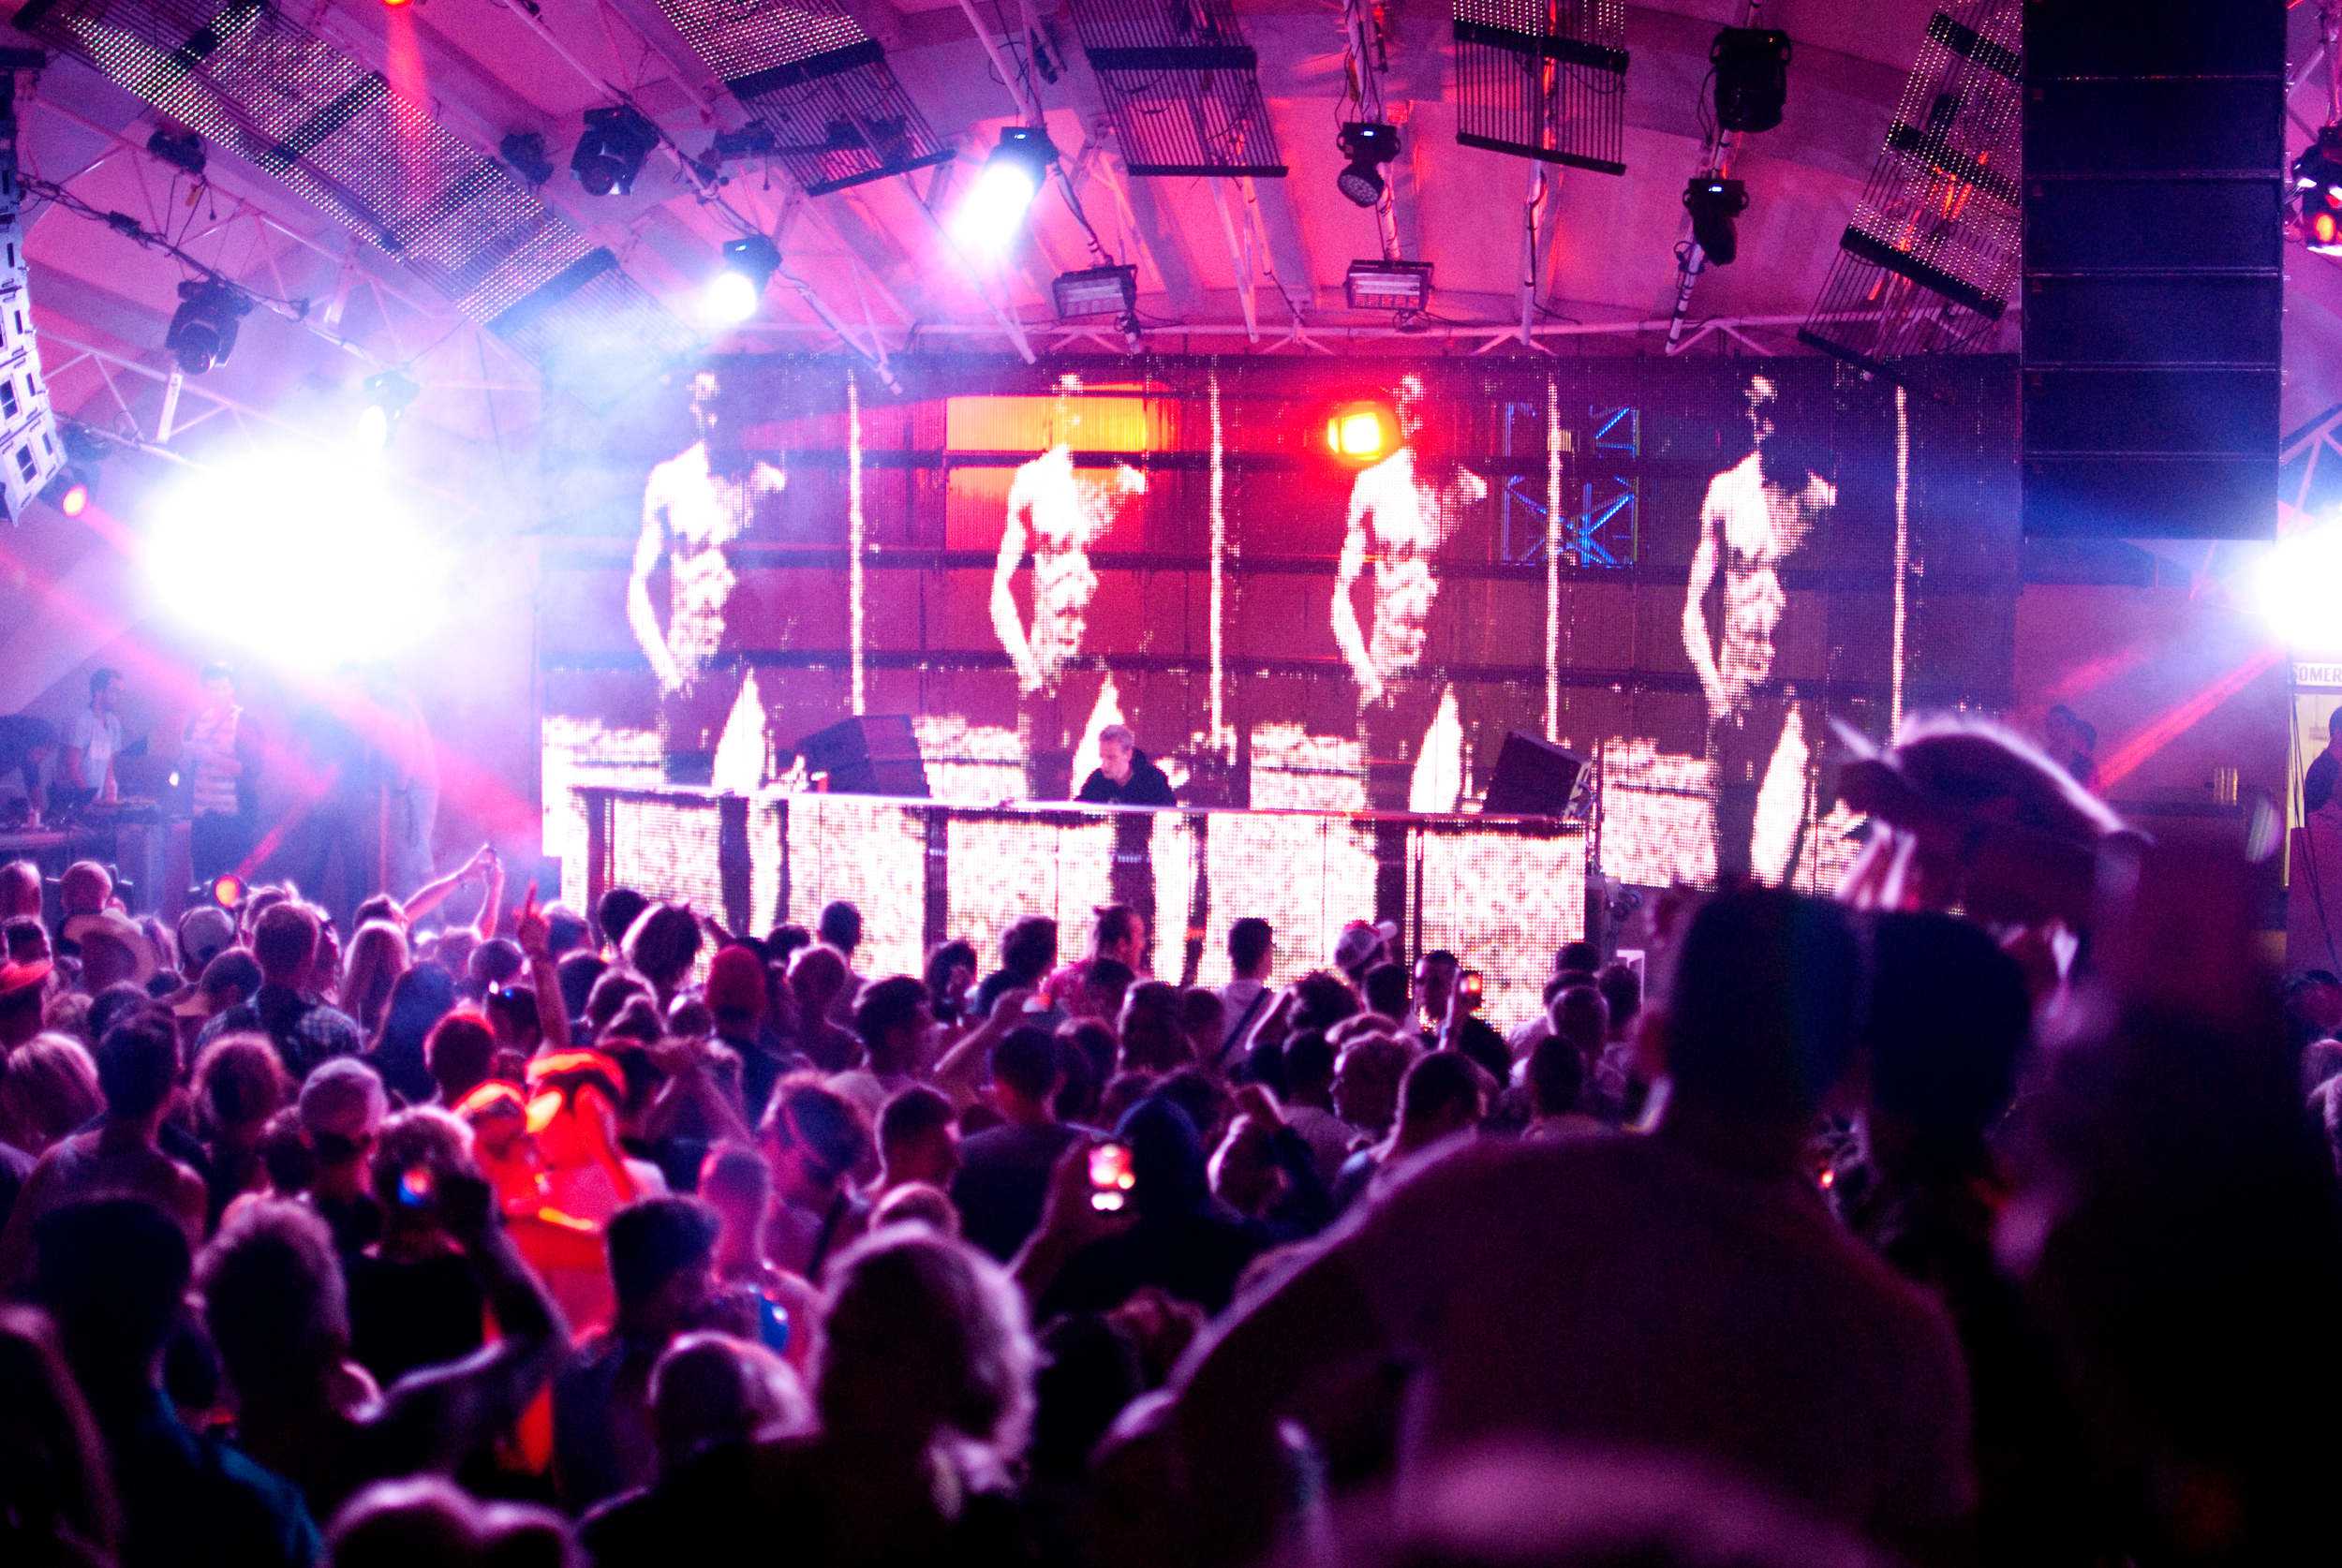 GeorginaCook_hideout_festival_croatia_crowd_club.jpg